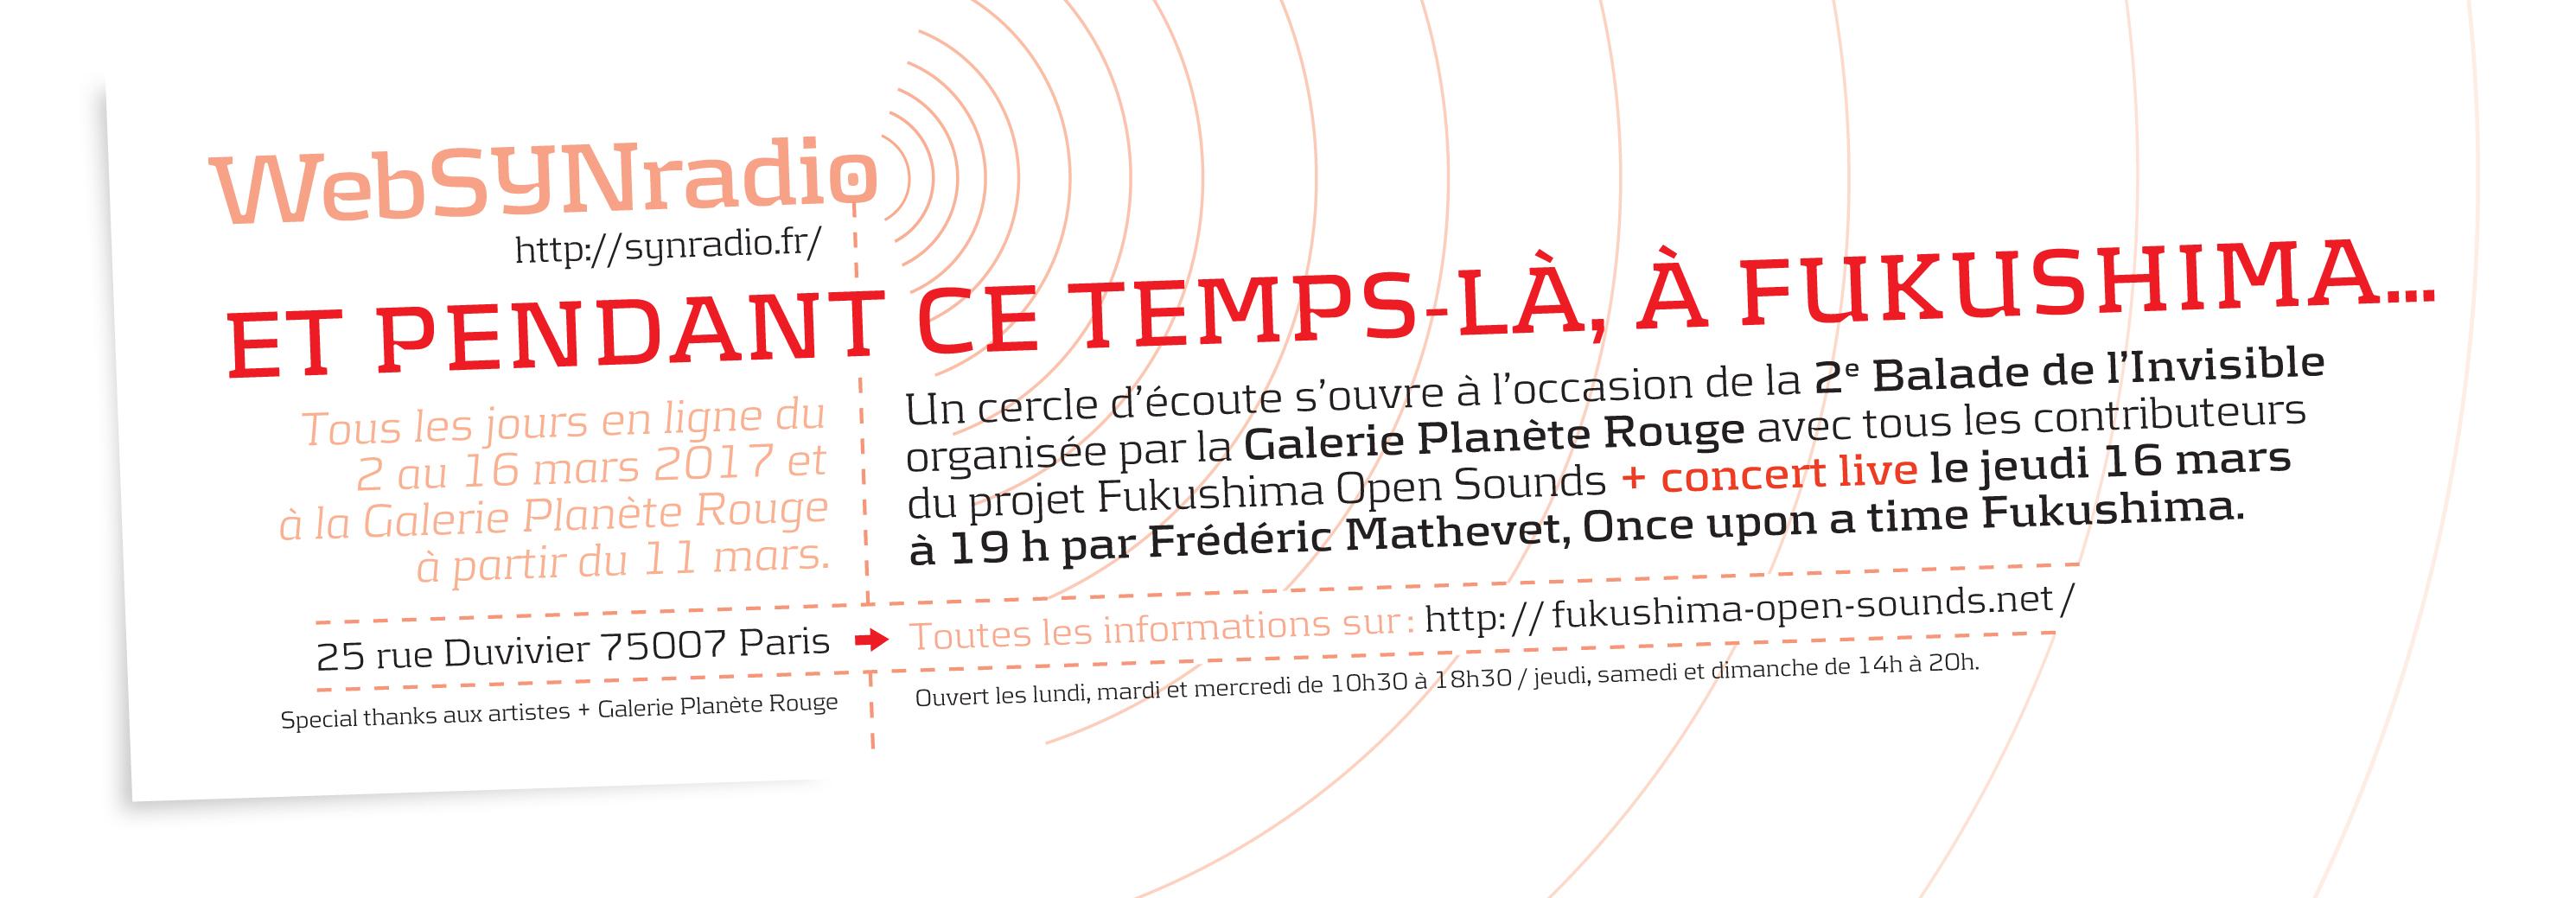 SYN-flyer--Galerie-planete-rouge-Fukushima